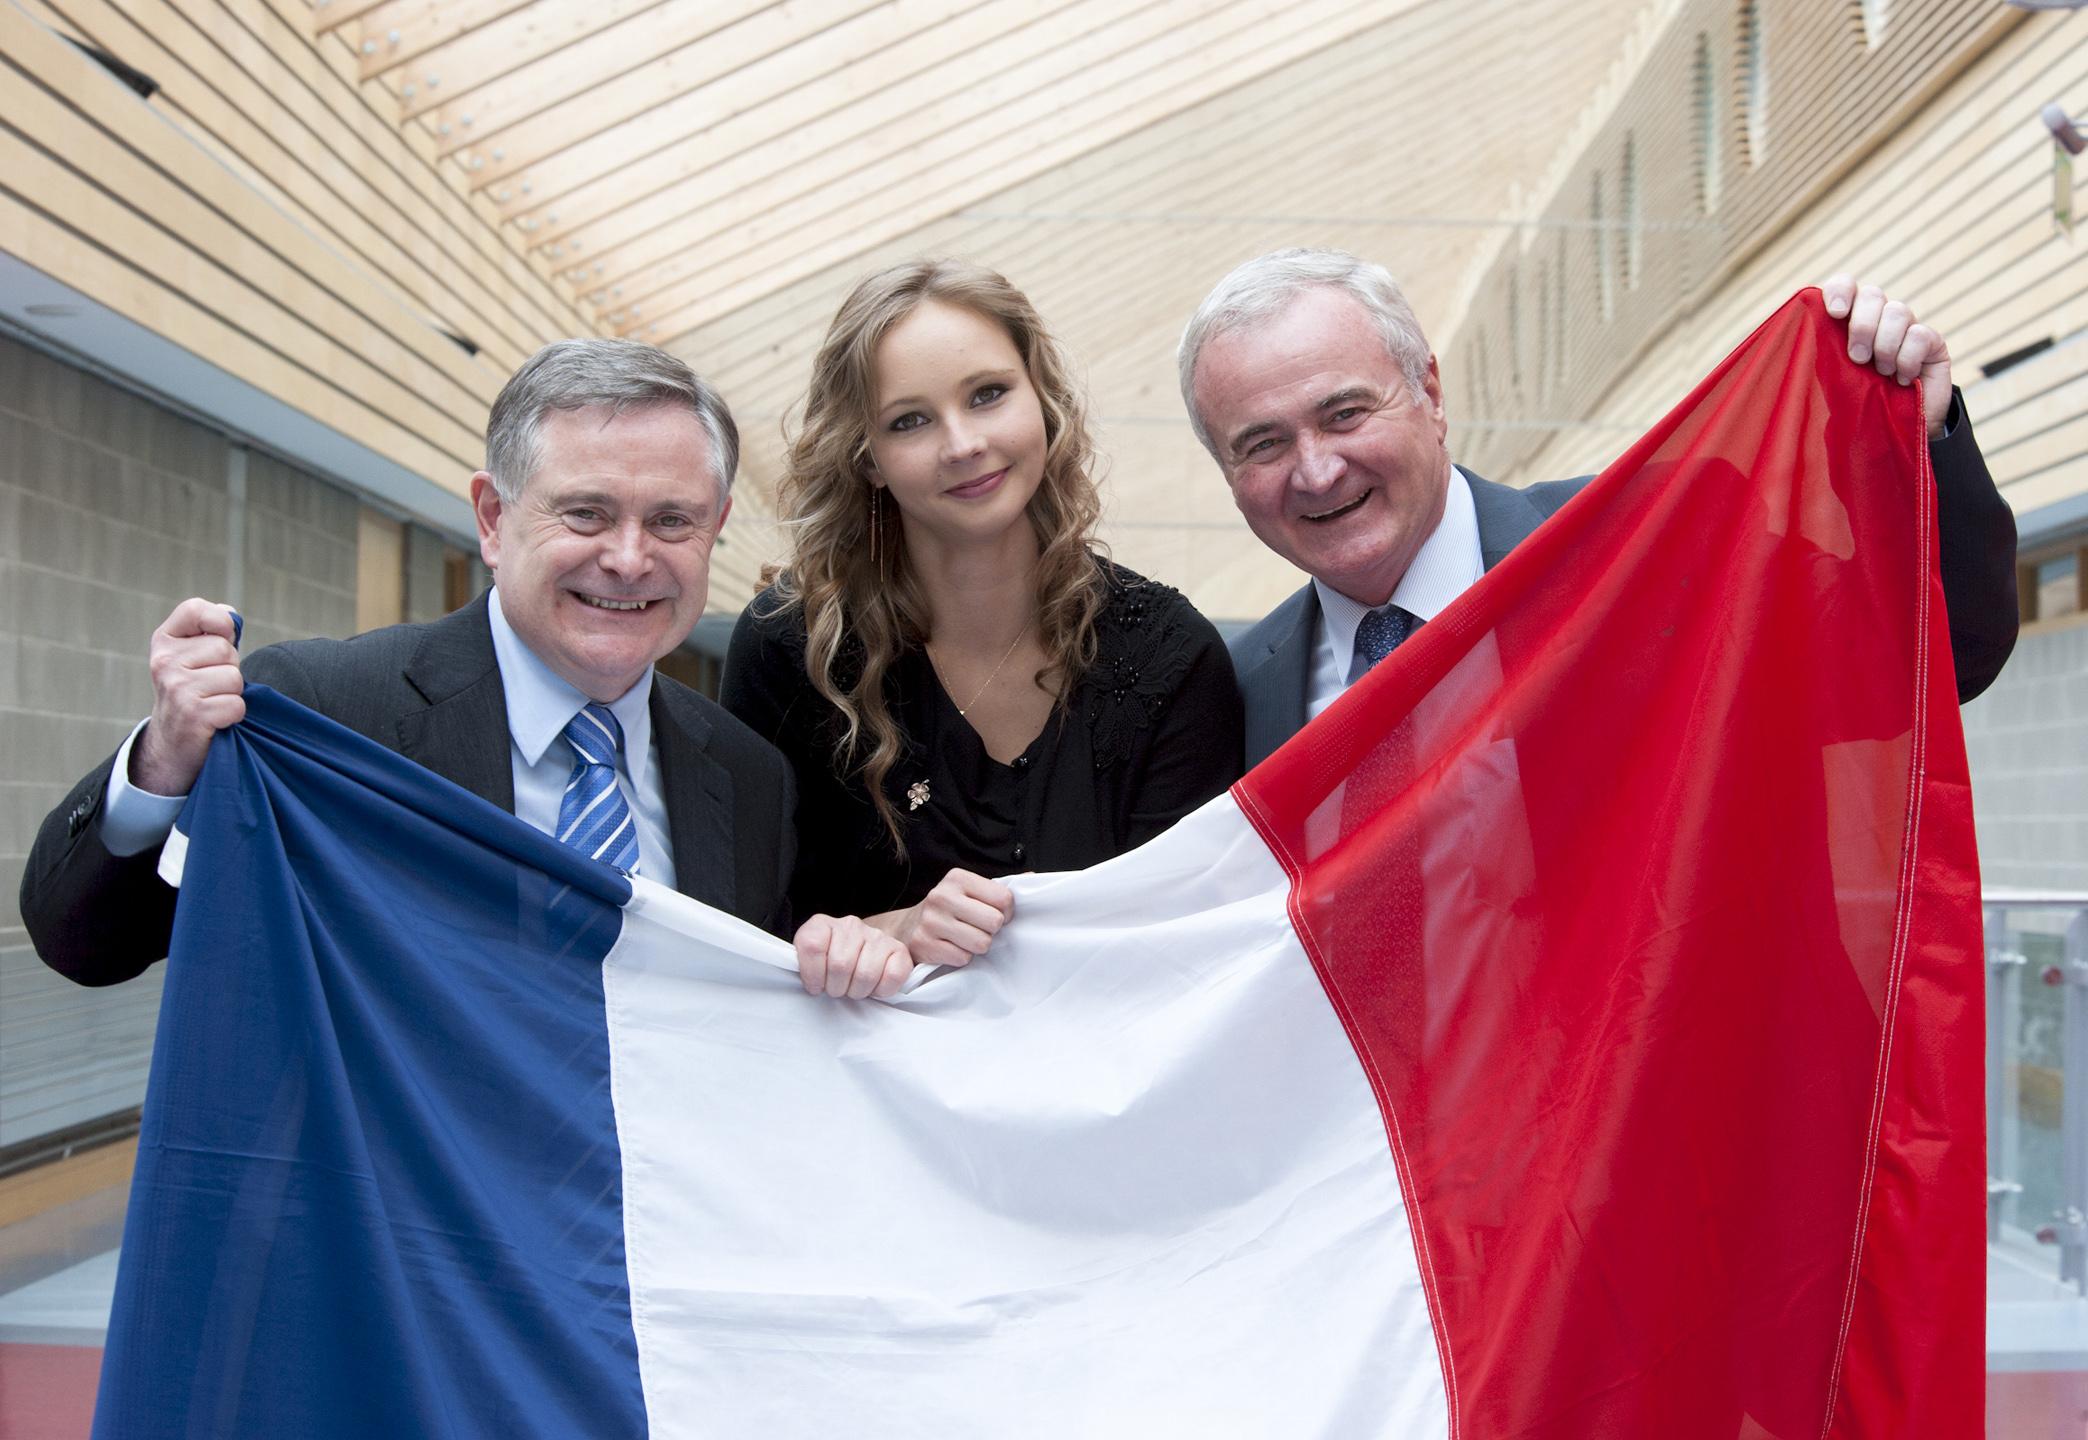 Mr Brendan Howlin, TD, Minister for Public Expenditure and Reform; student Liene Korsiete, The Moyne, Enniscorthy, and Mr. Yanni